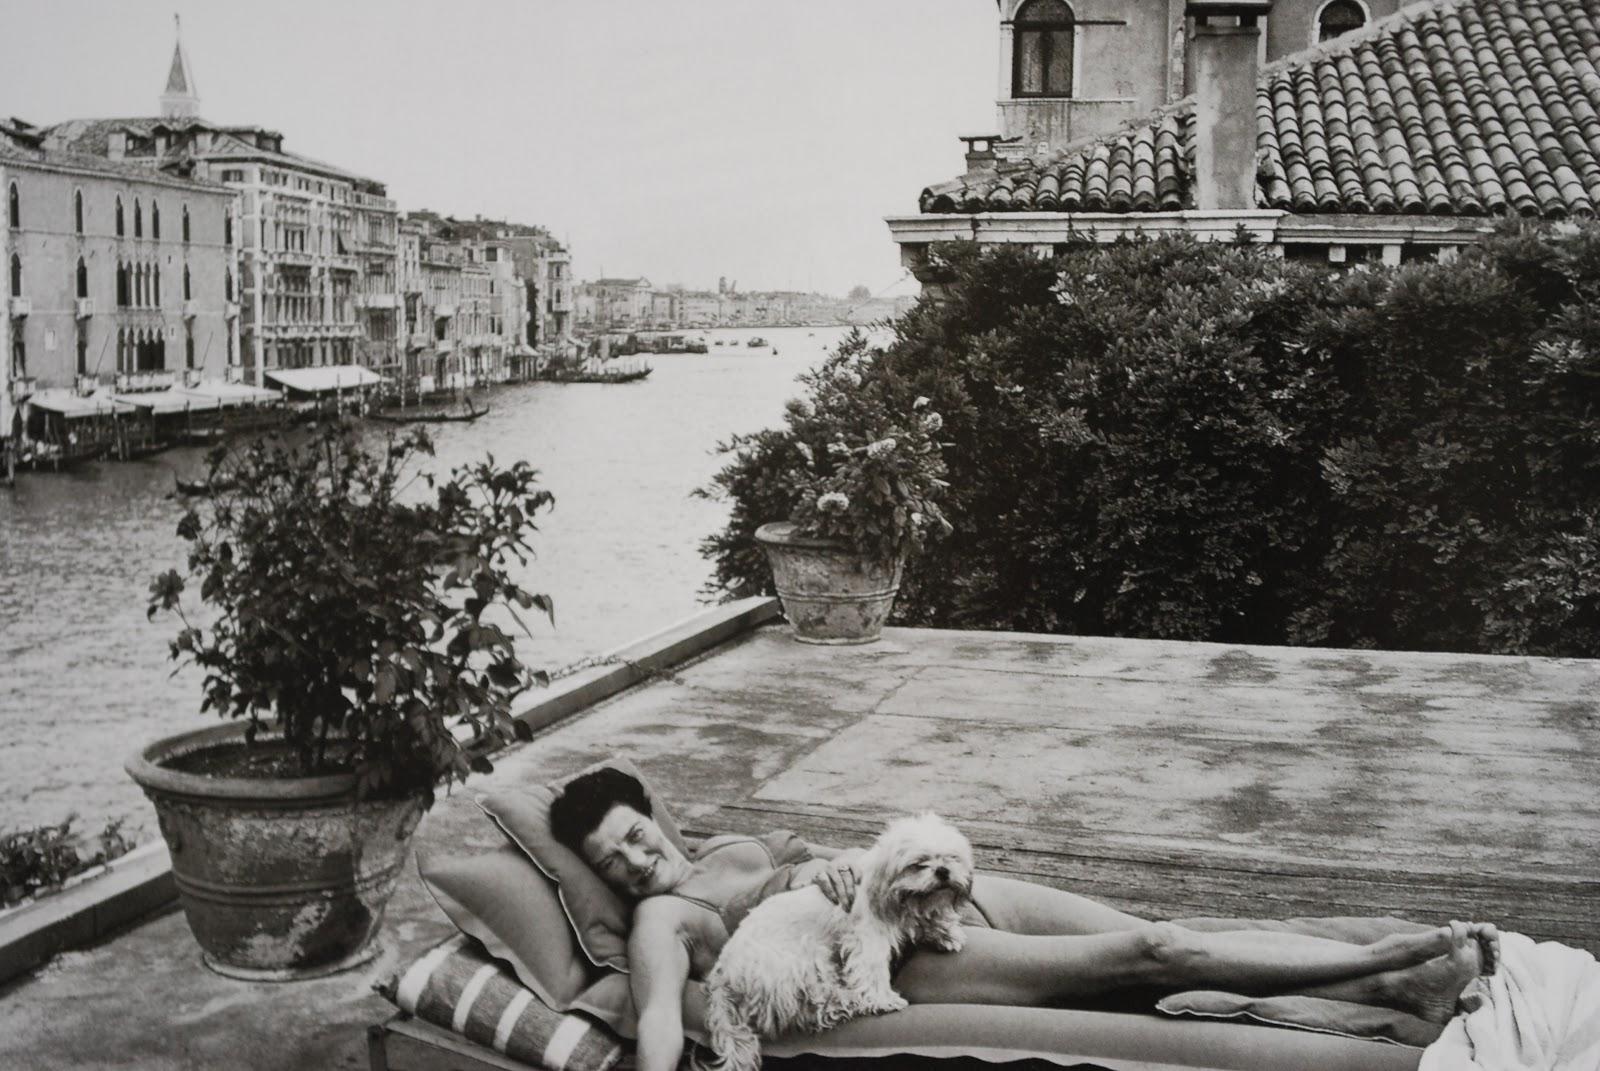 Peggy Guggenheim in Venice 1953 | Herringbone: herringbonemallord.blogspot.com/2011/12/peggy-guggenheim-in-venice...